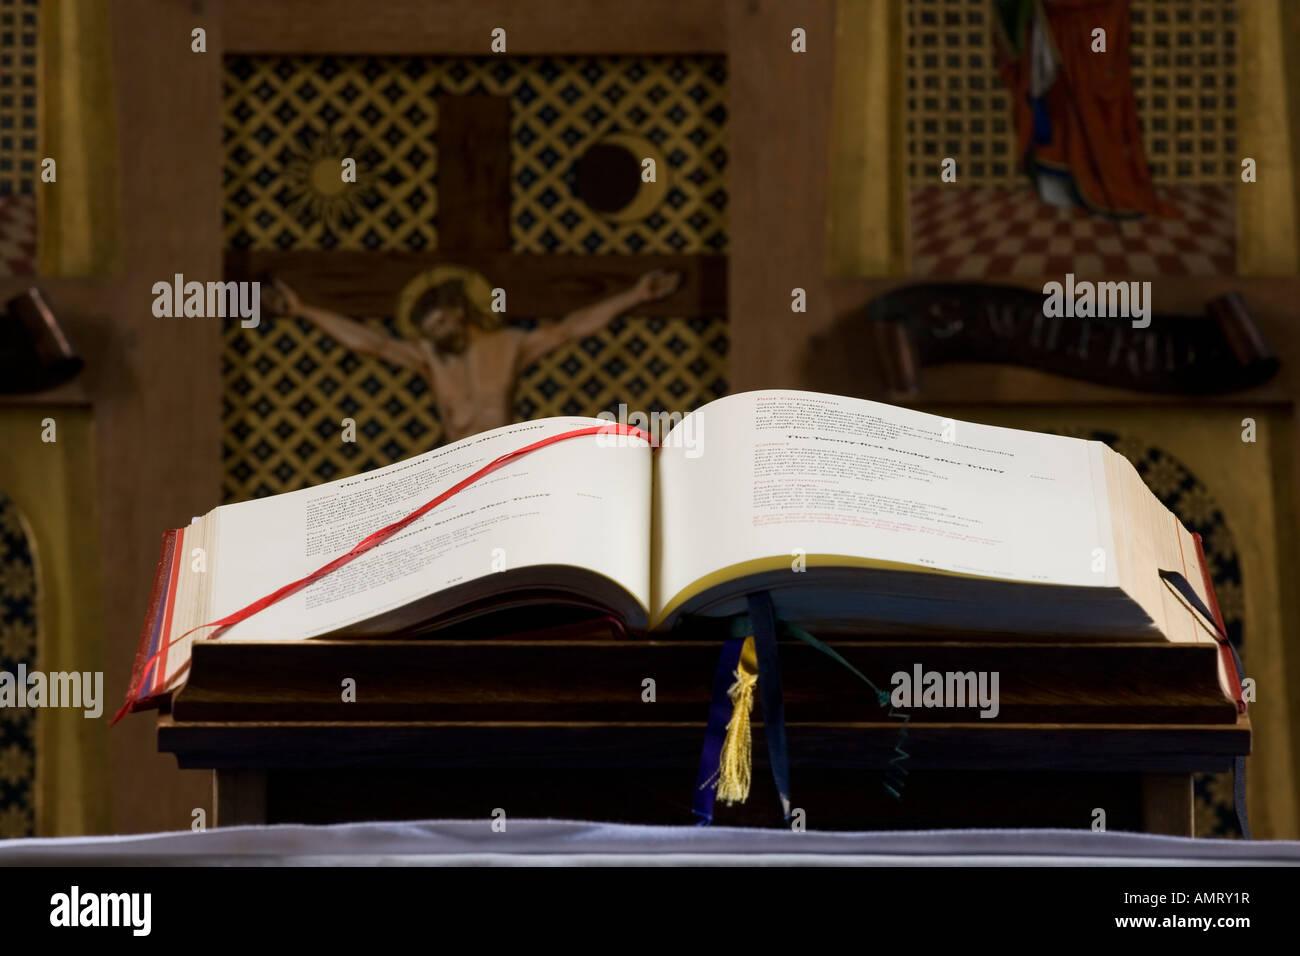 Service Book Stock Photos & Service Book Stock Images - Alamy